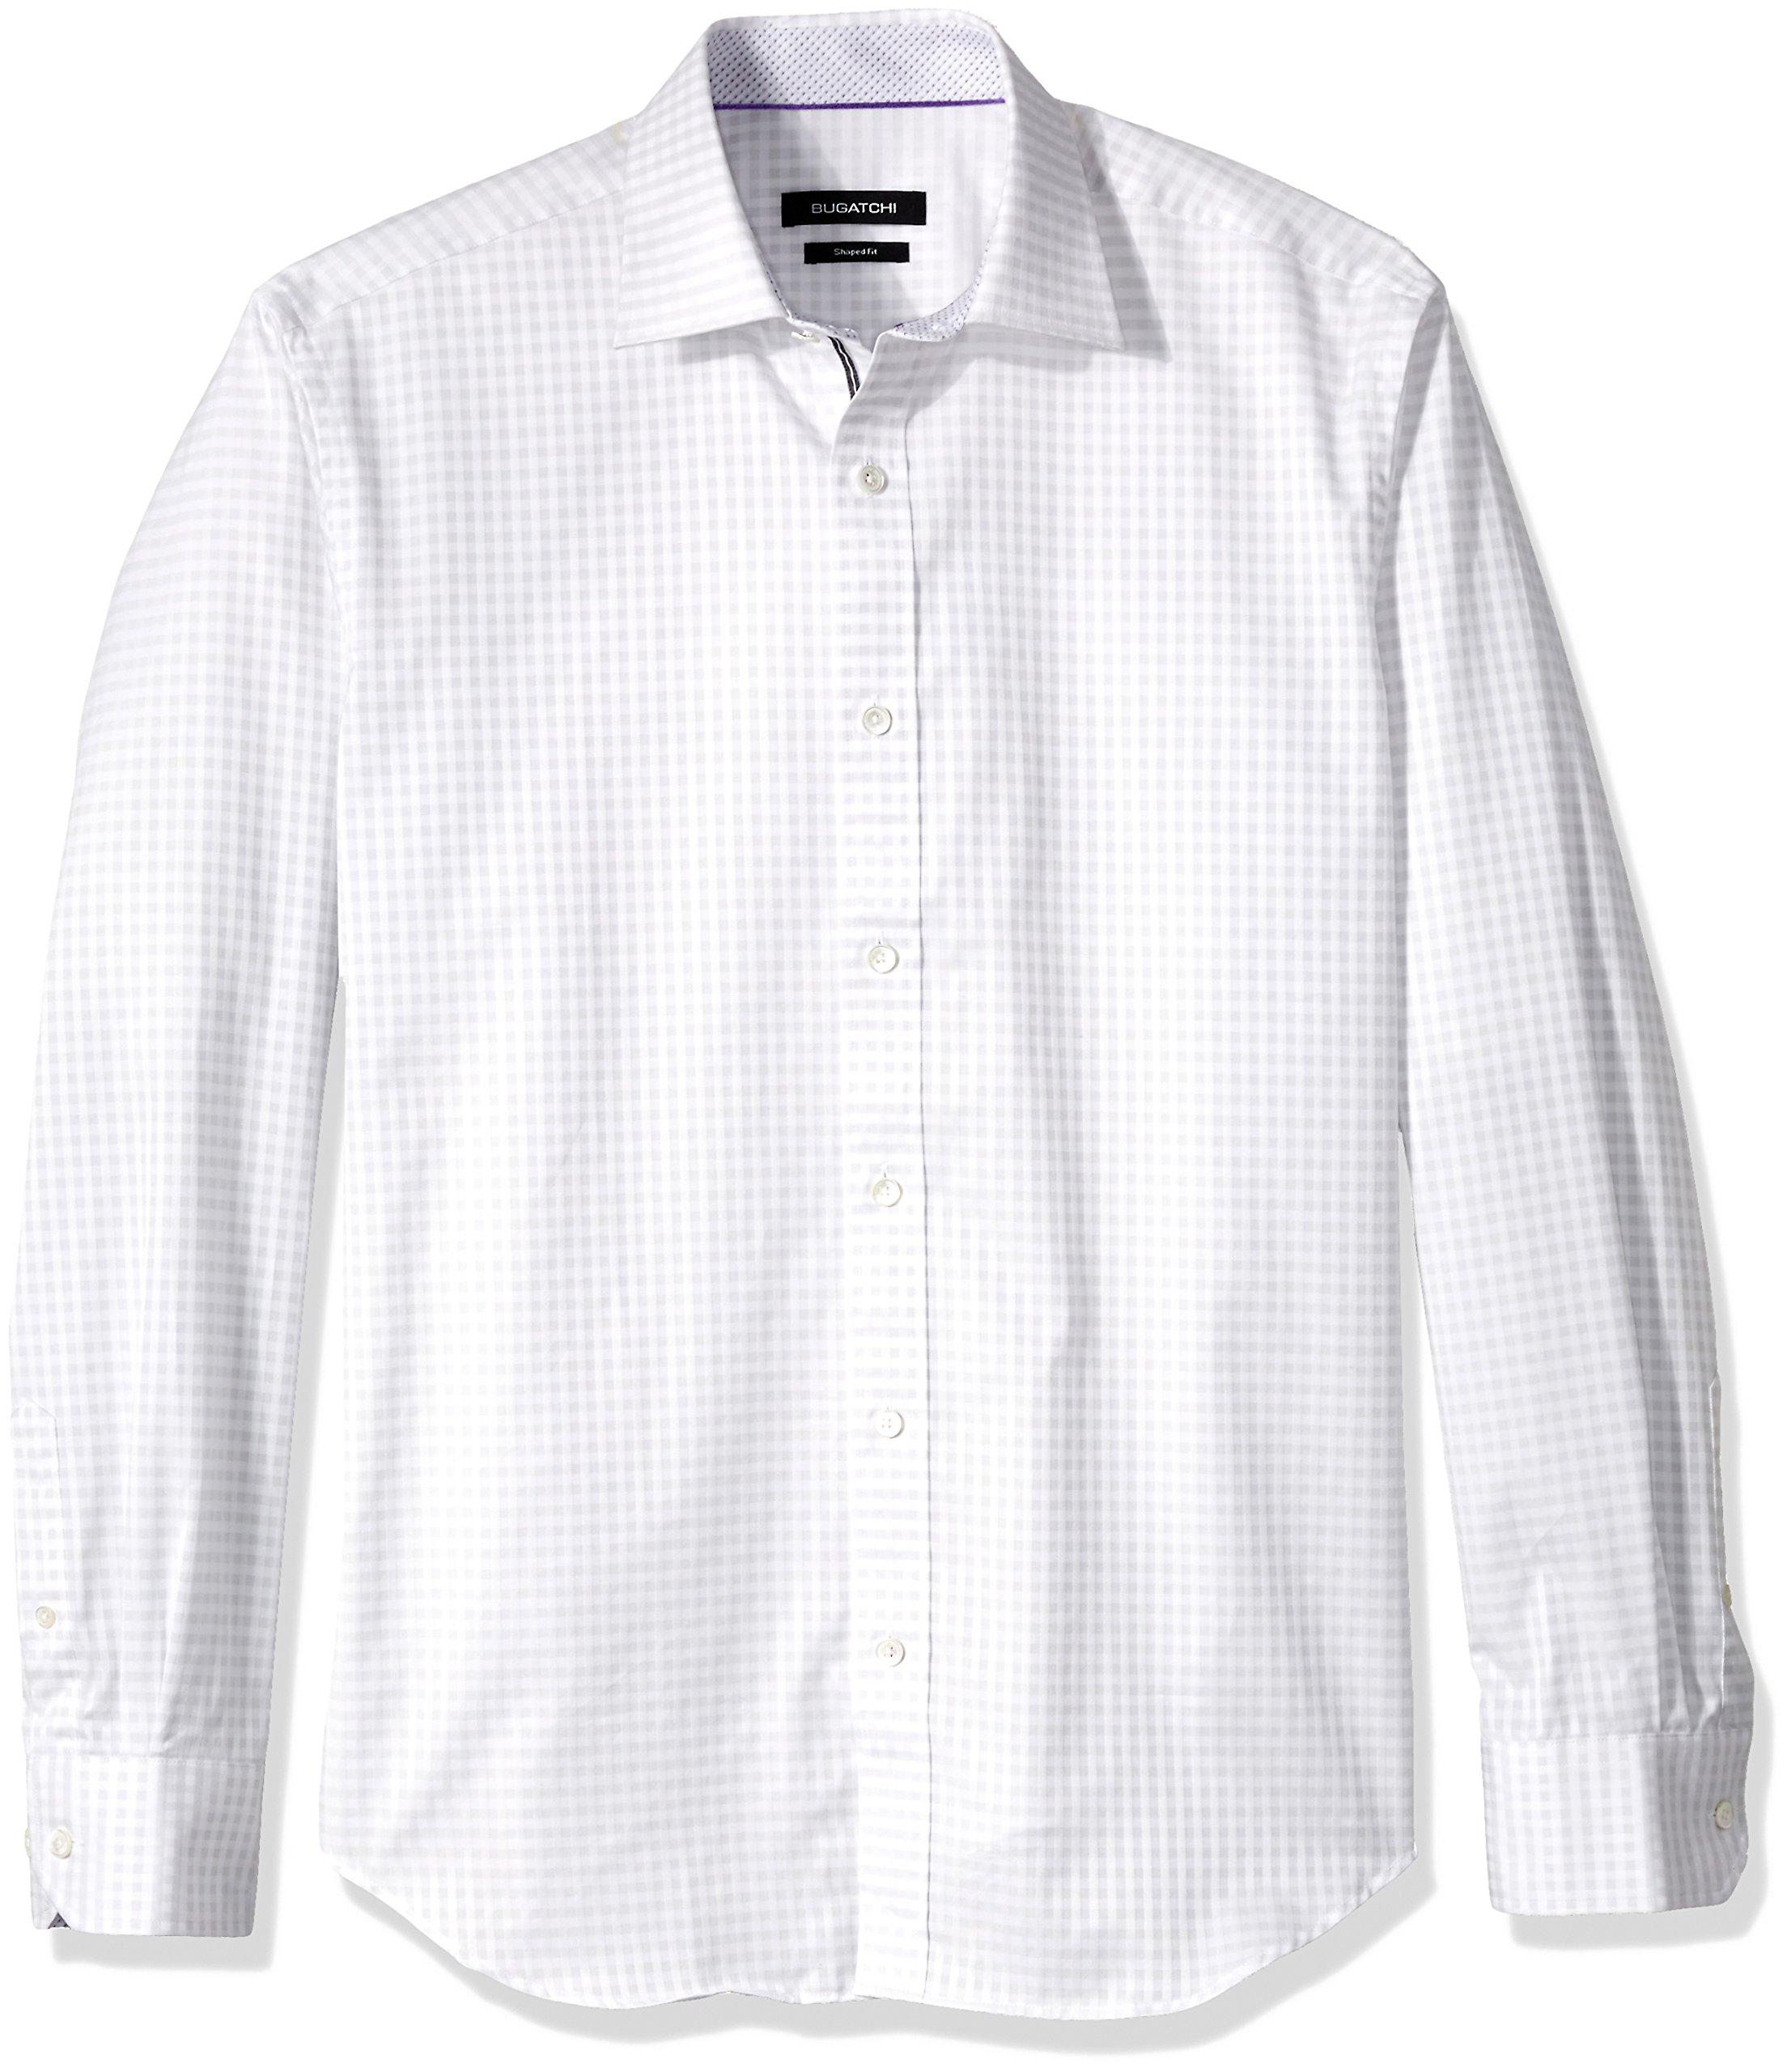 BUGATCHI Men's Cotton Shaped Fit Point Collar Shirt, White, X-Large